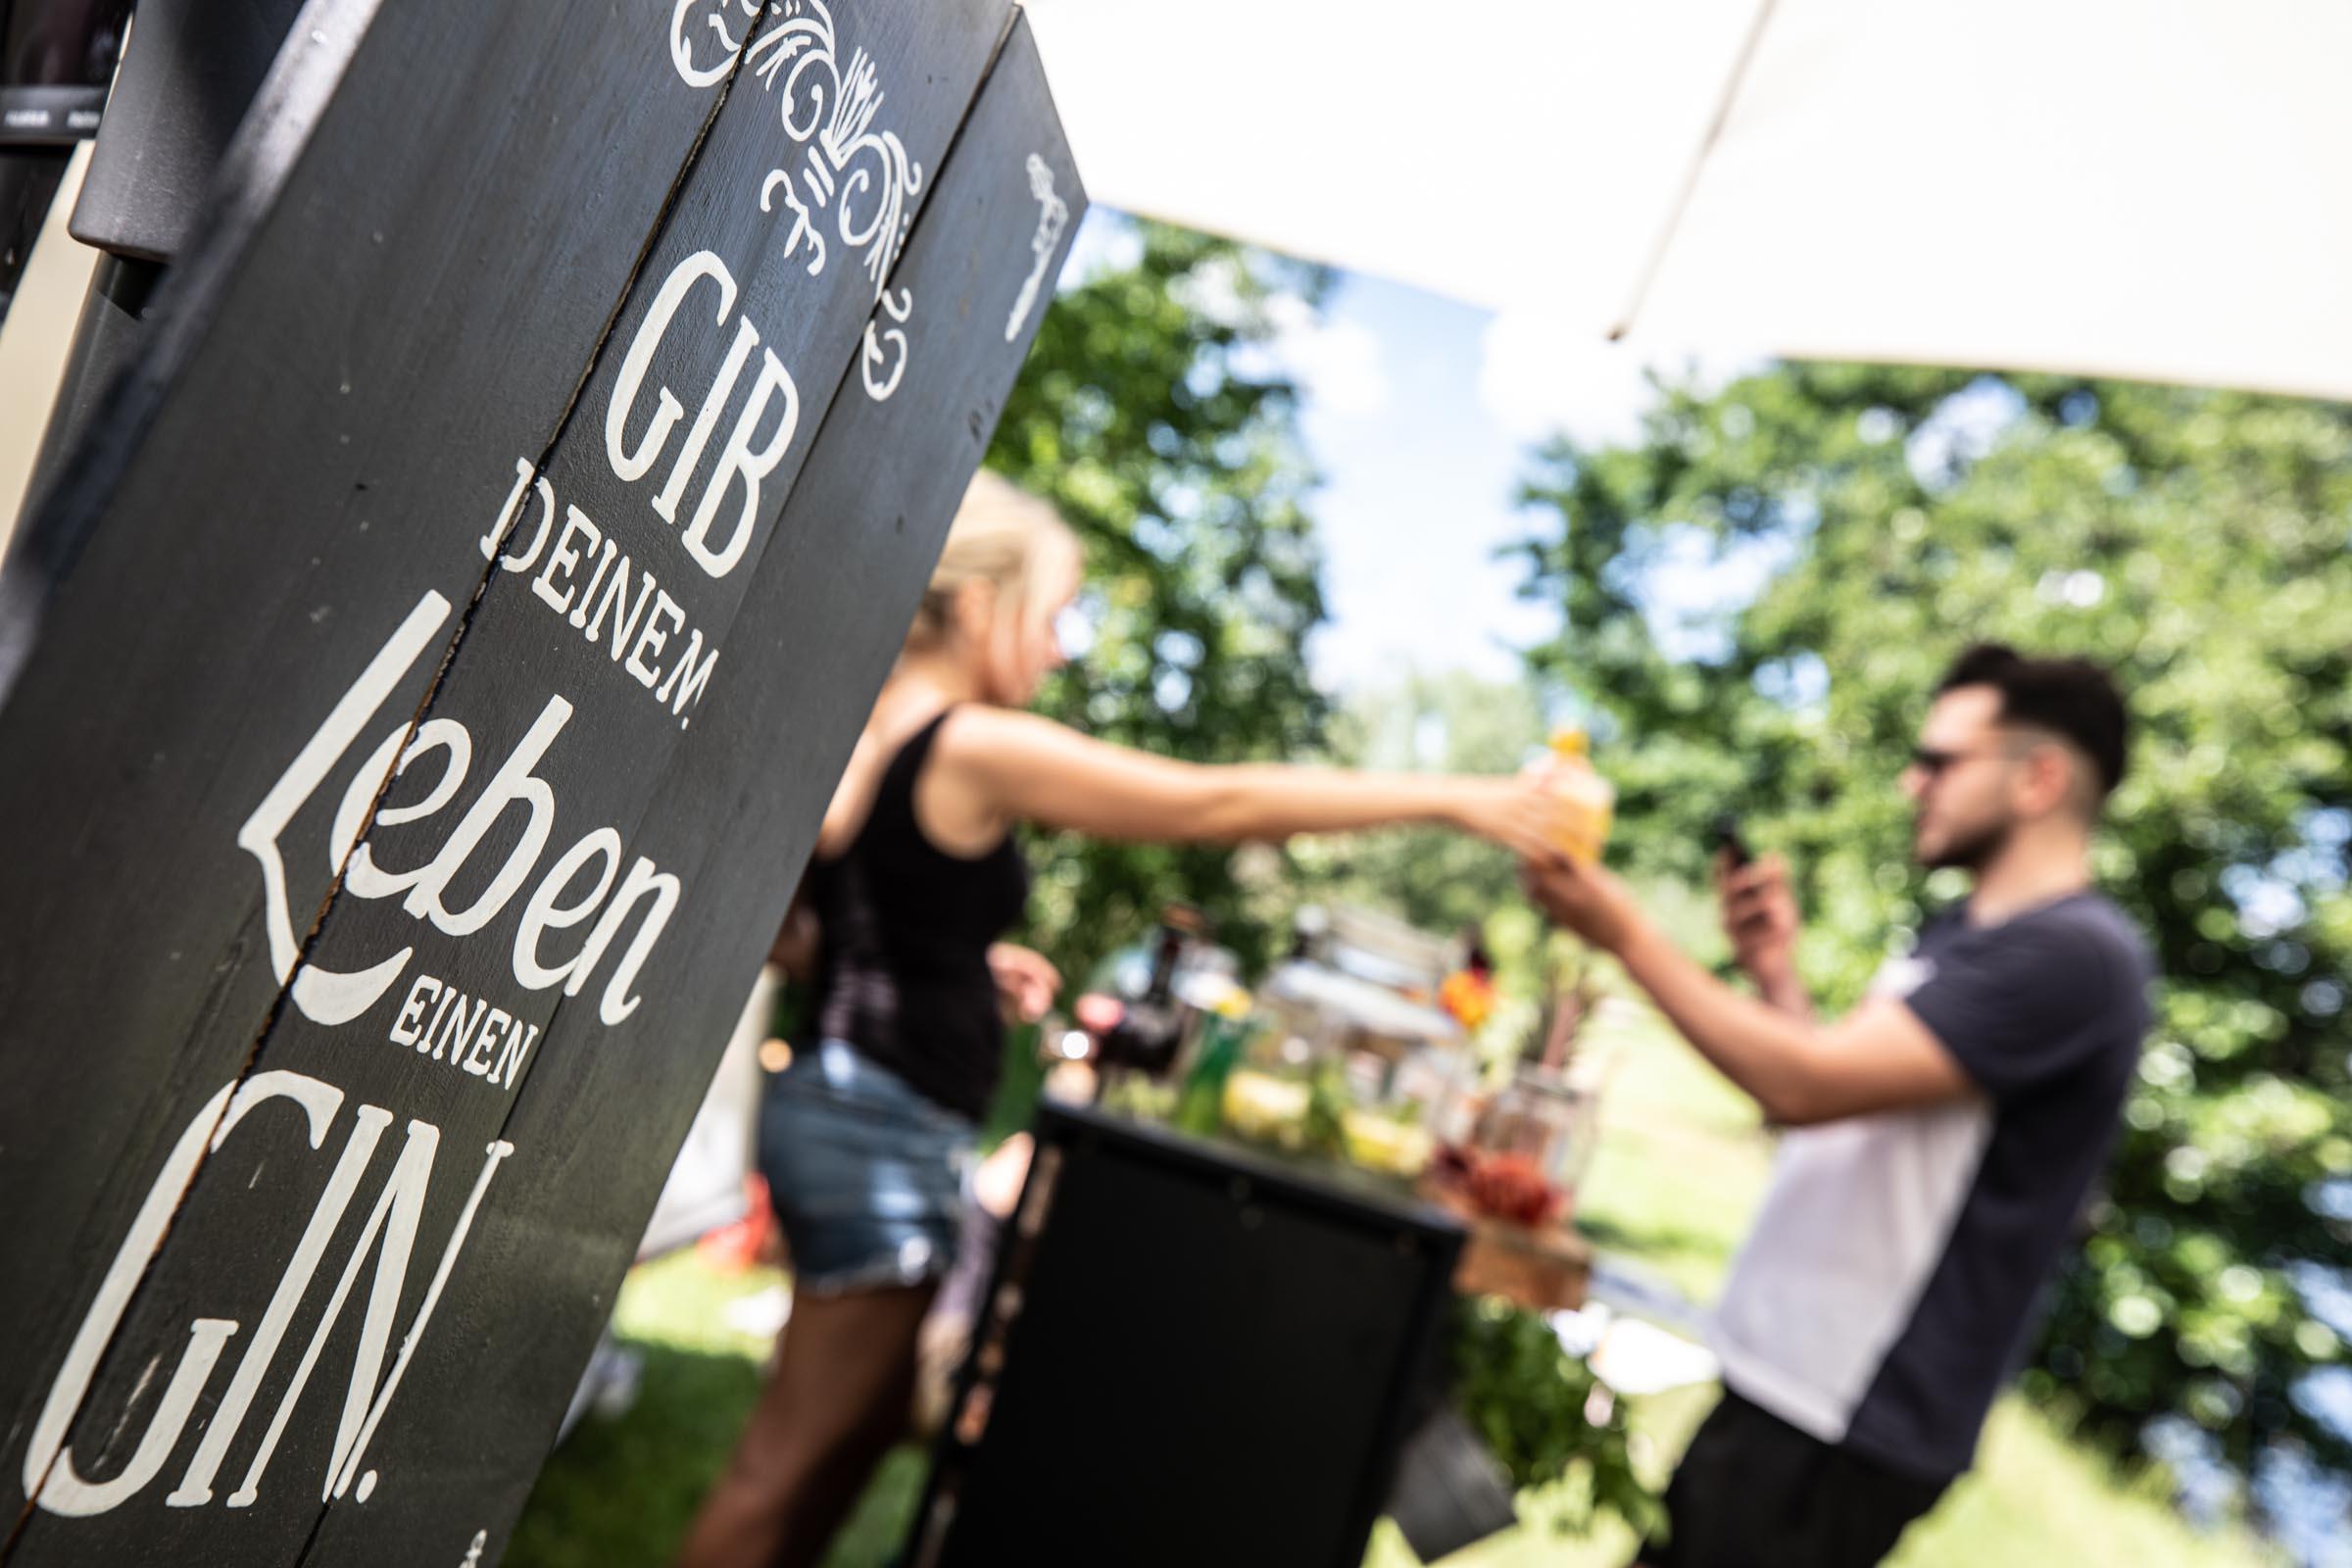 Mobile | Bar | Cocktailservice | Hannover | Getränke | Catering | Cocktails | Wein | Ginbar | Weinbar | Foddtruck | Aperitif | Hochzeit | Messe | Firmenfeier | Buchen | Mieten | Anfragen